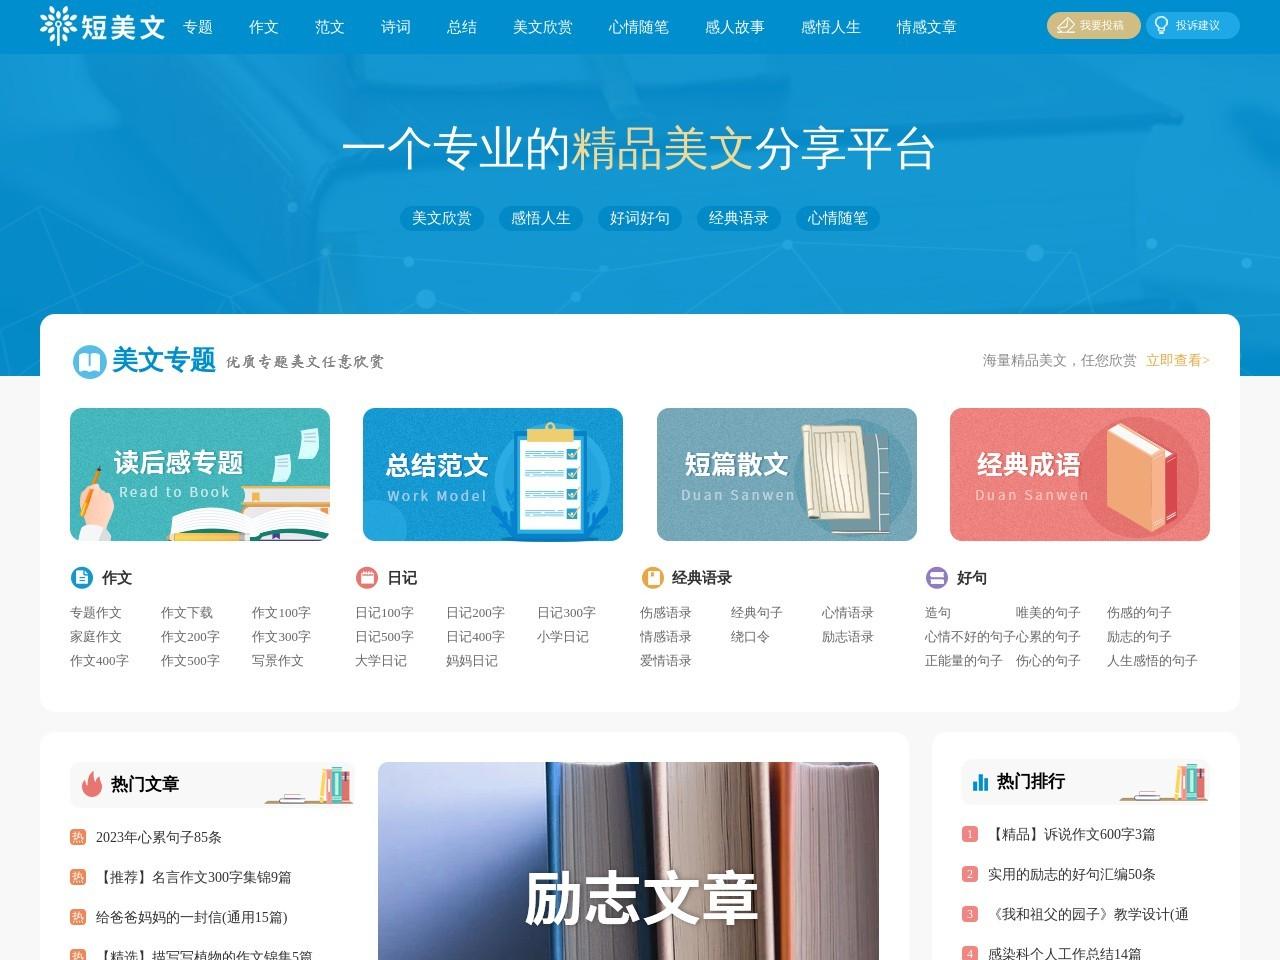 好词好句大全(www.duanmeiwen.com)